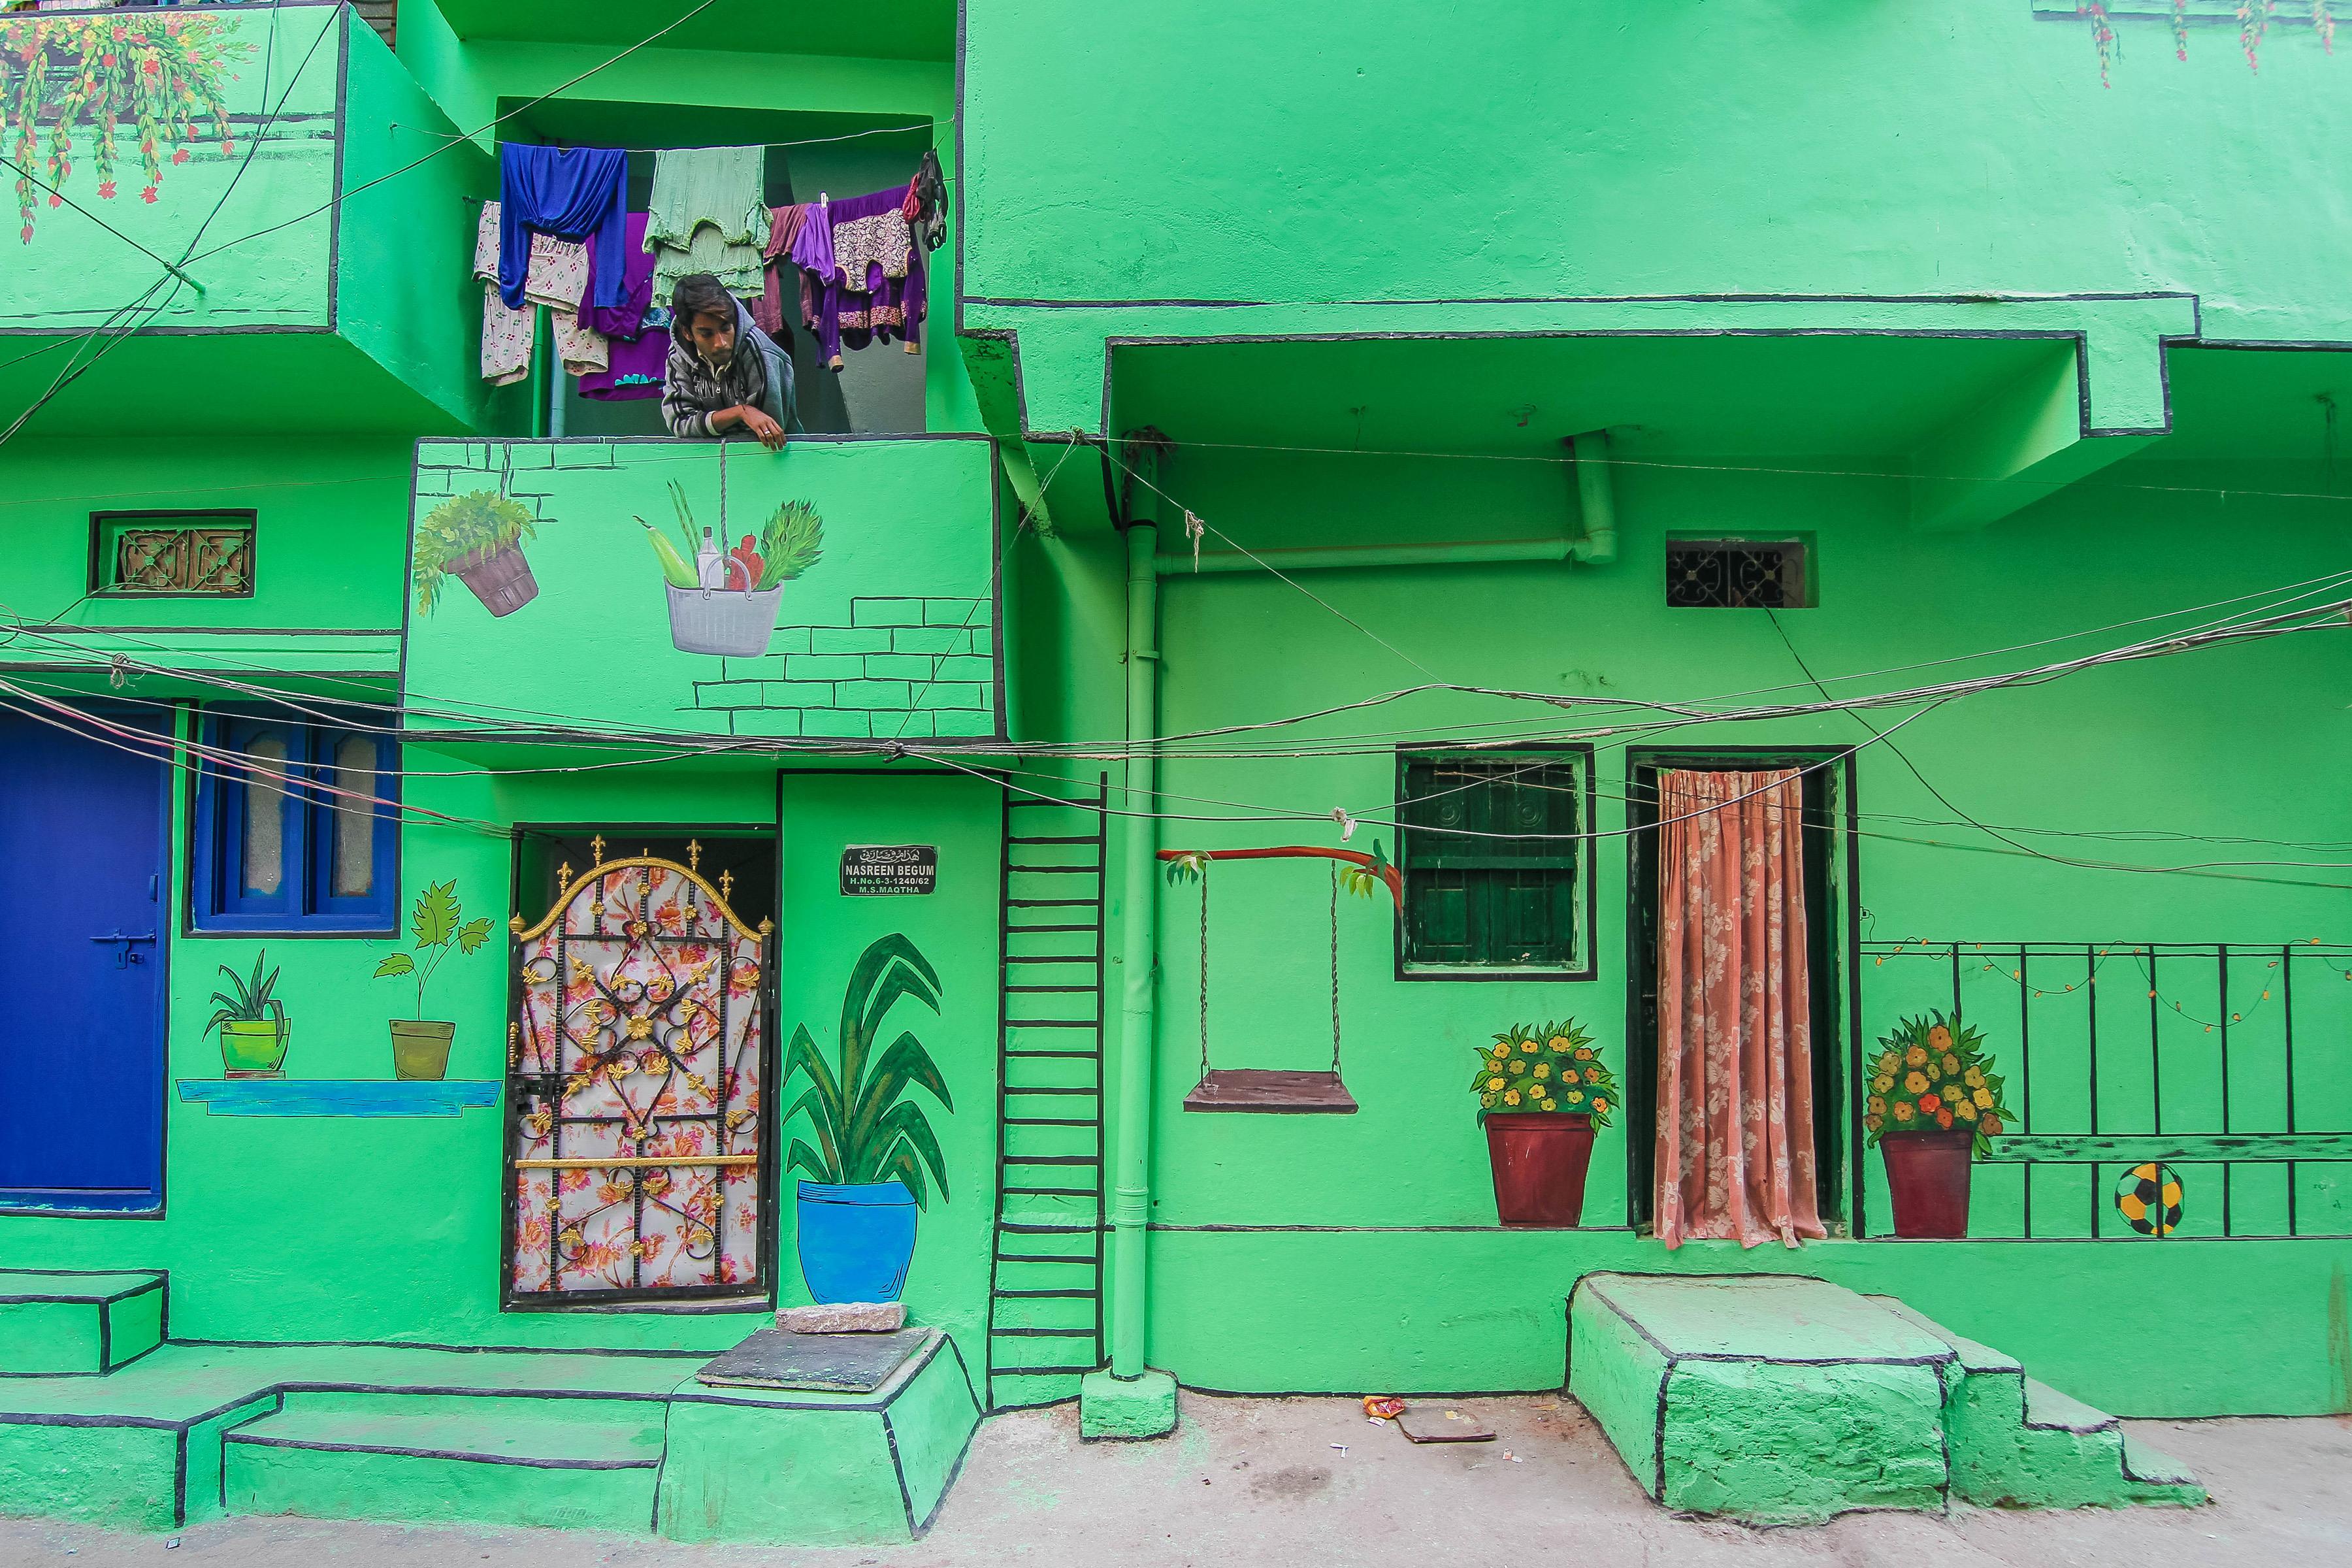 Hoozinc Green Gully Maqta Art District2017 Pranav Gohil 8